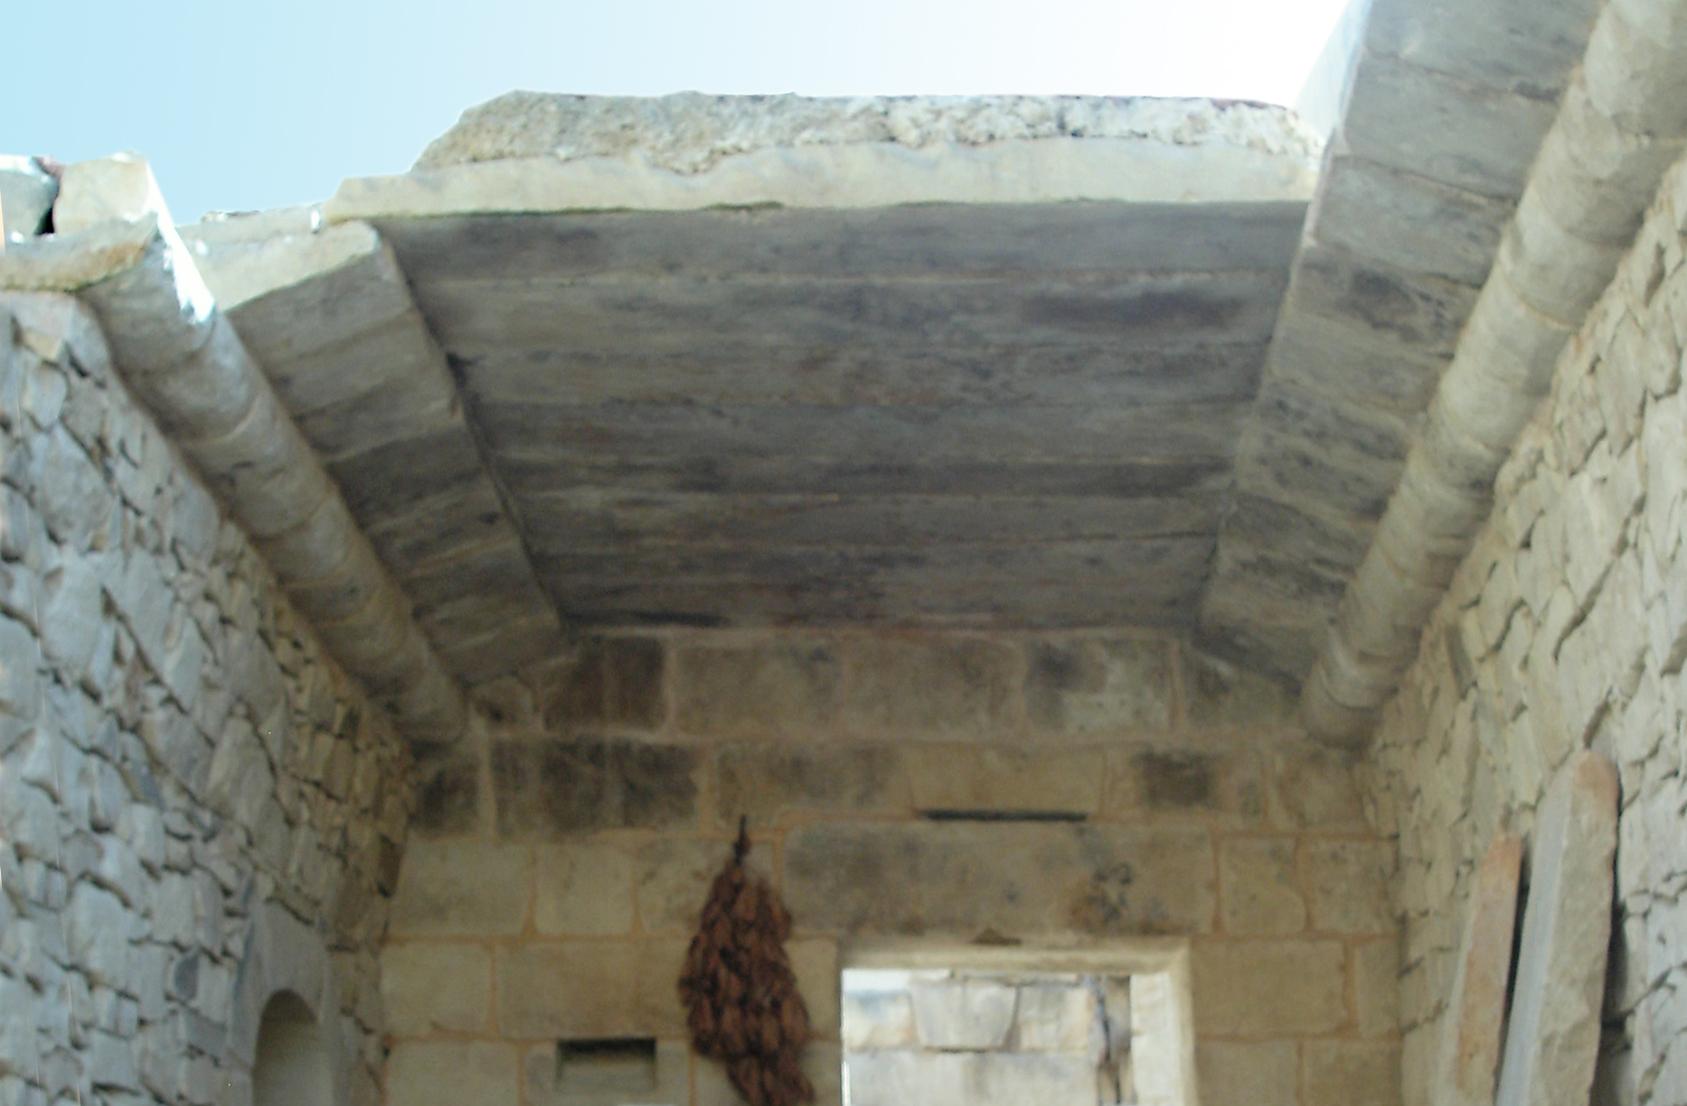 Fichier:Couverture terrasse traditionnelle.jpg — Wikipédia